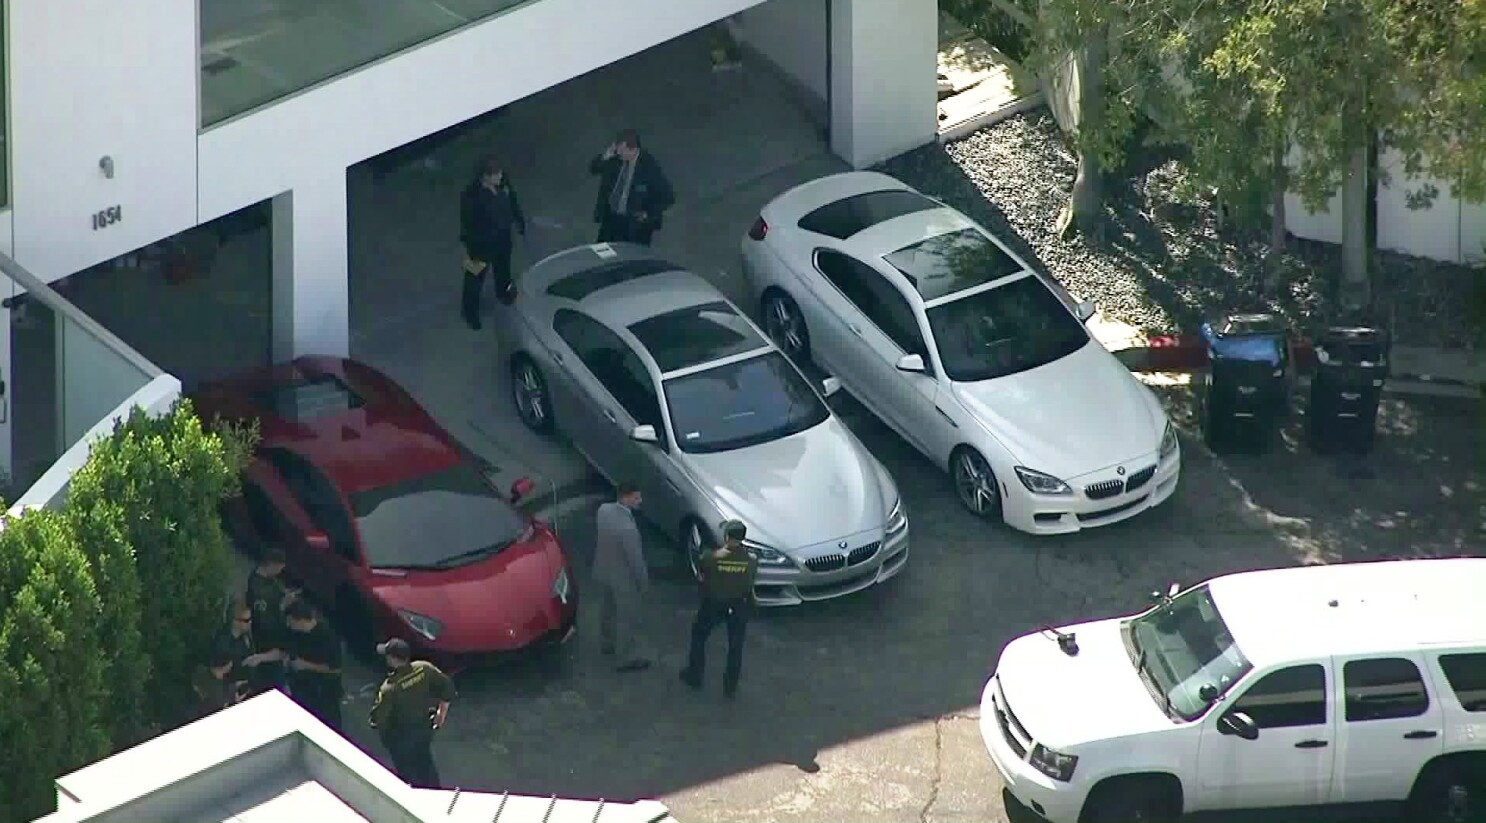 Deputies raid rapper YG's Hollywood home after shootout left 1 dead